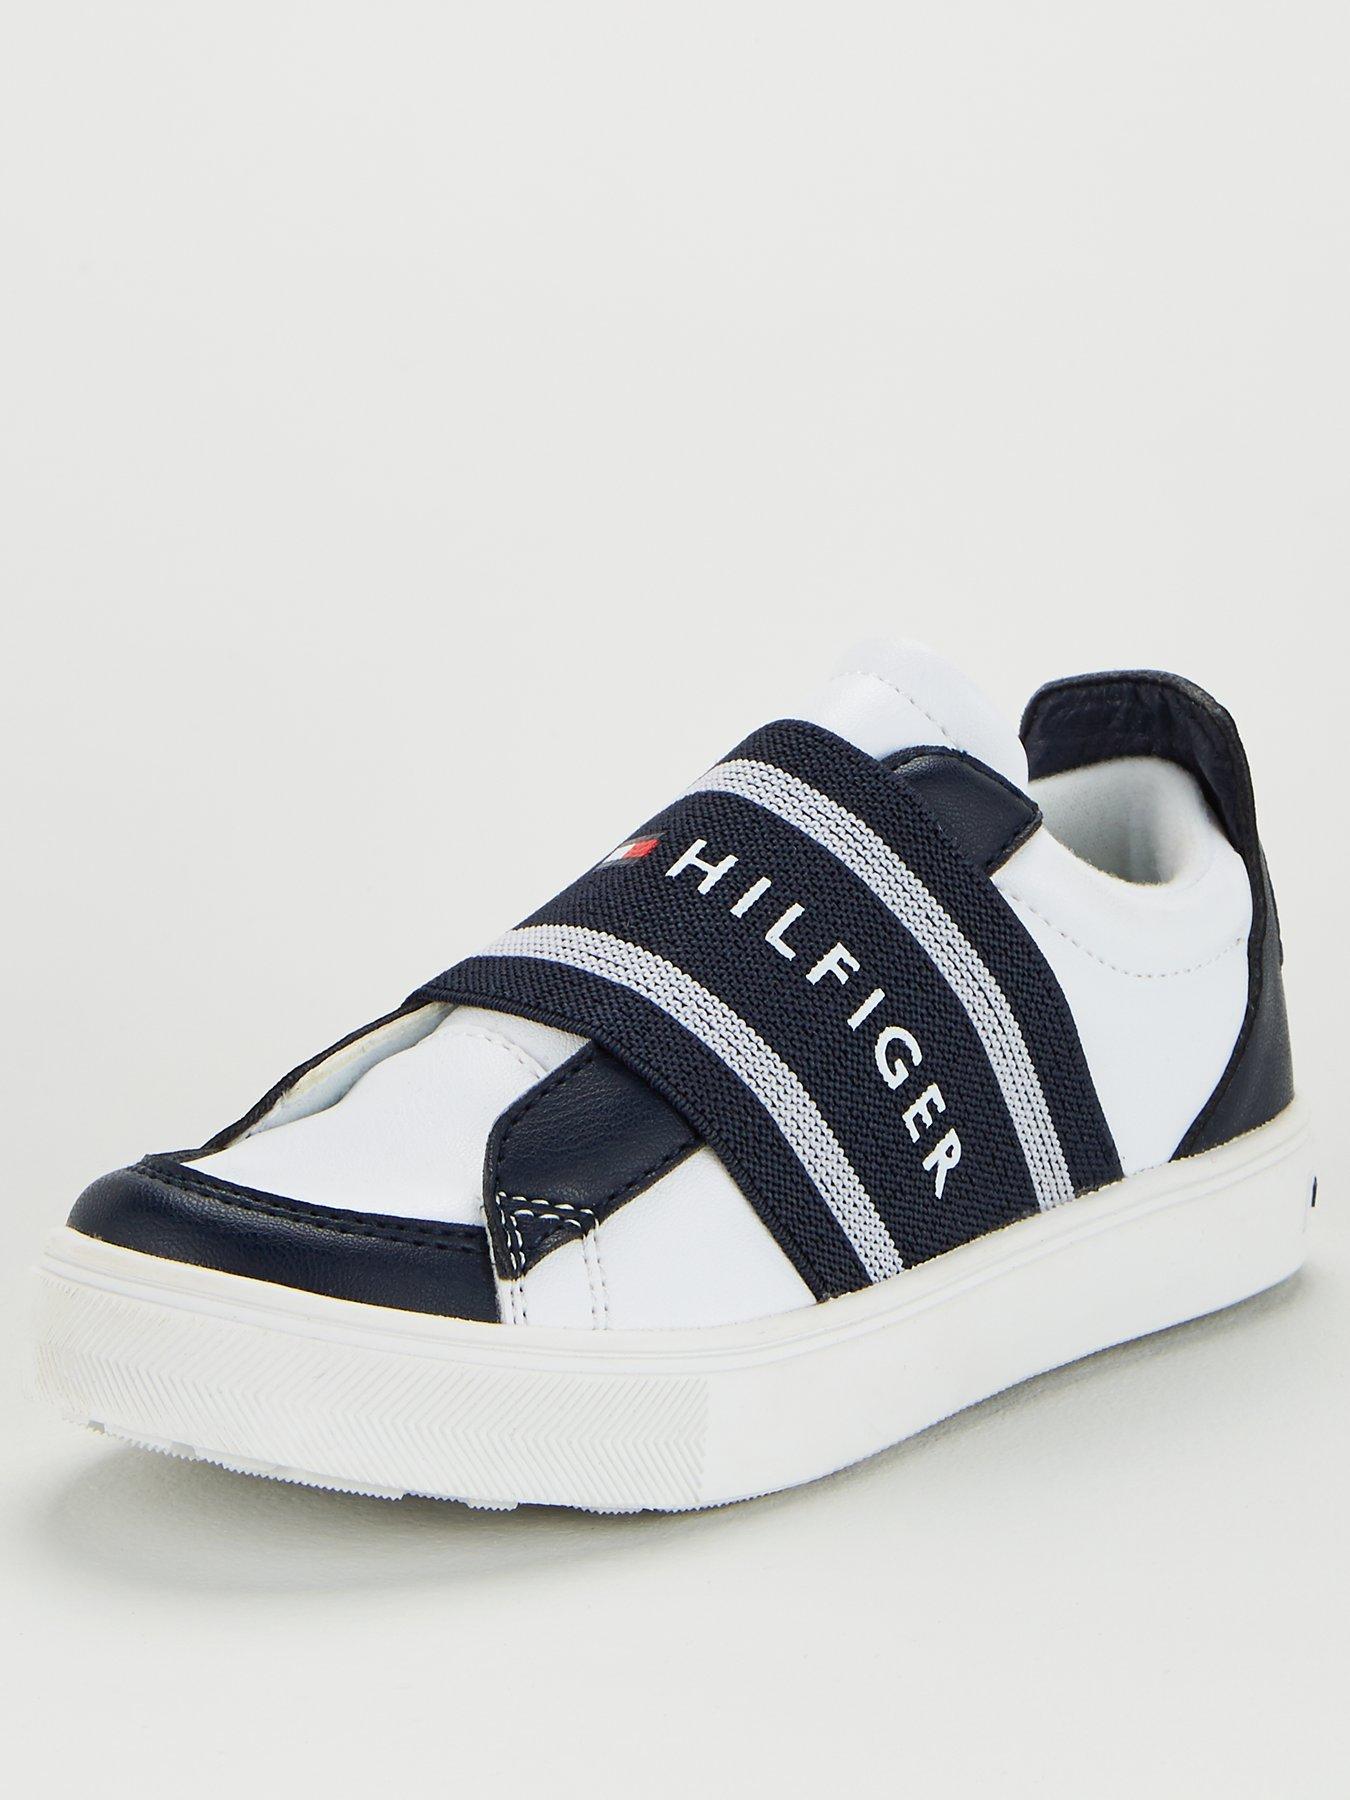 Tommy Hilfiger Womens Laddin White Size